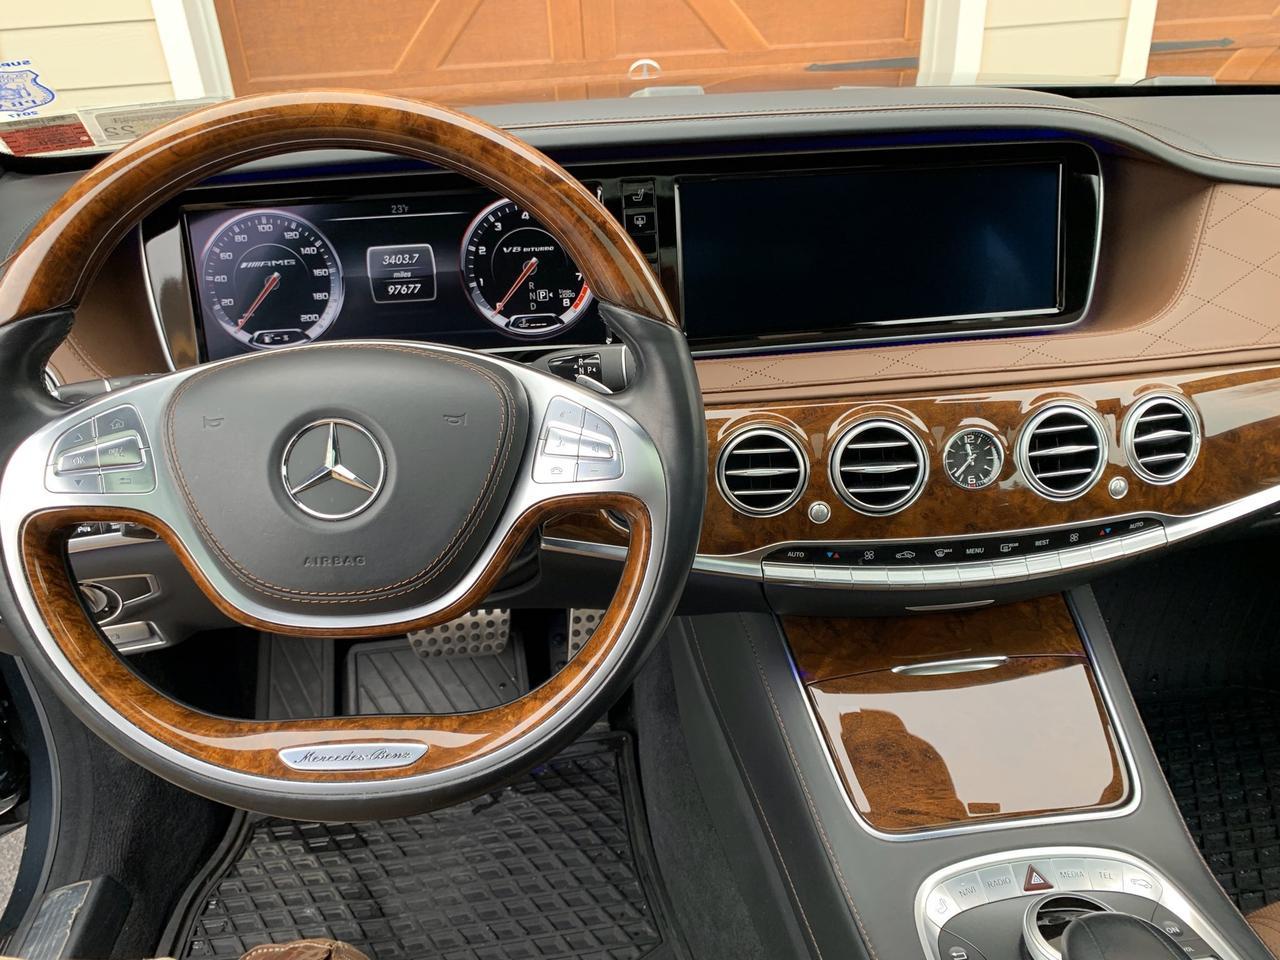 Mercedes Benz Cars Index Fórum